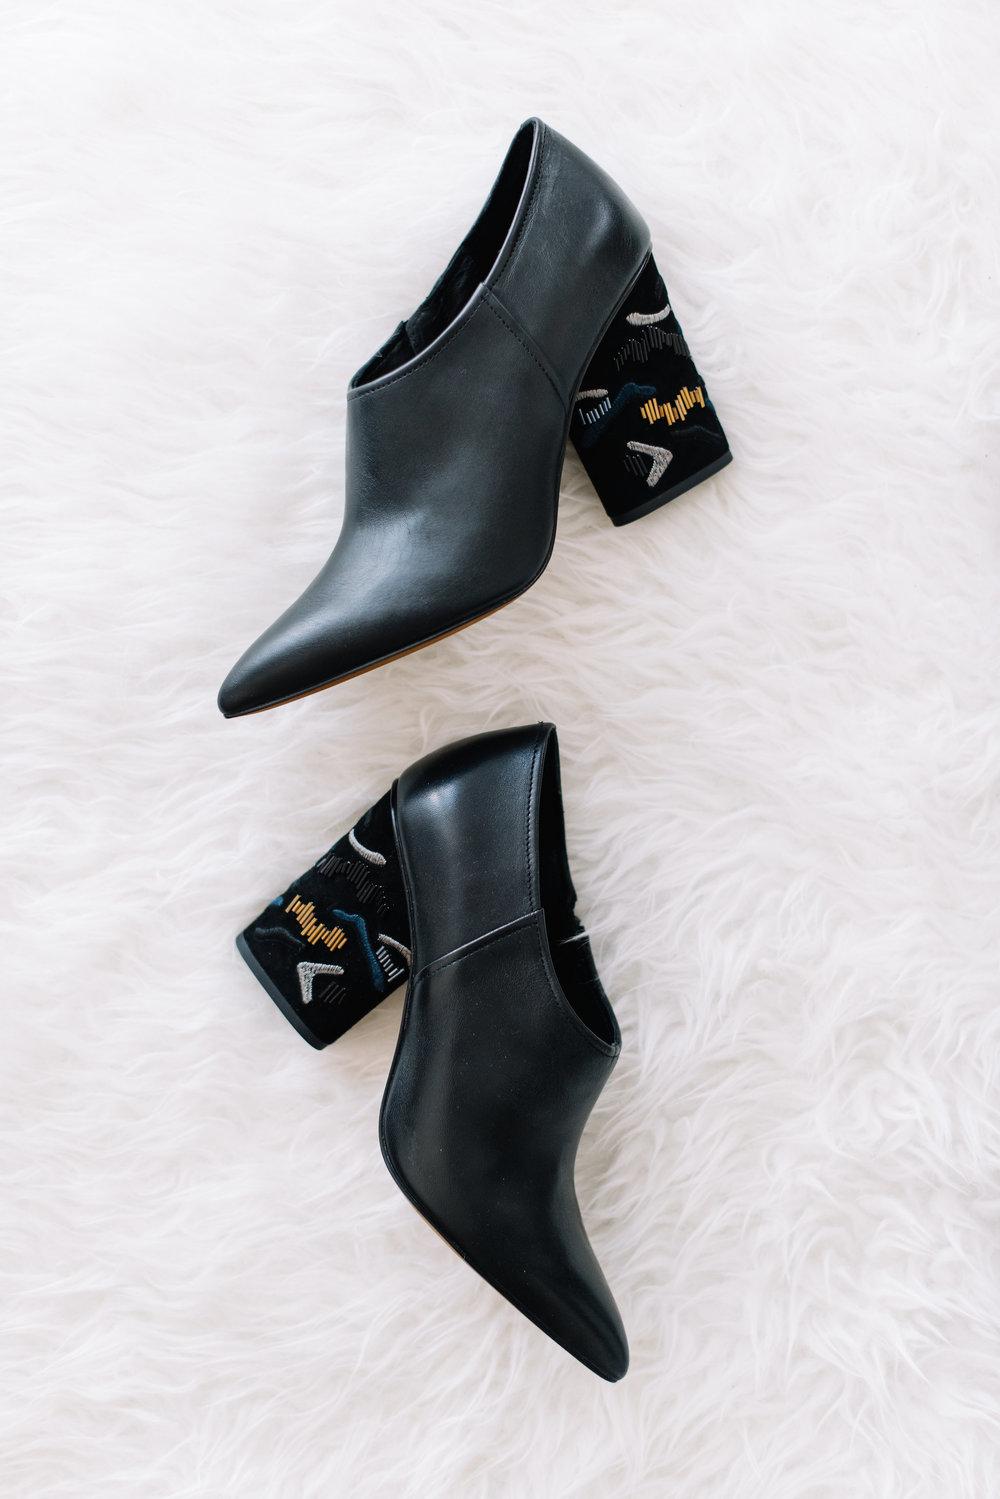 stylish black booties